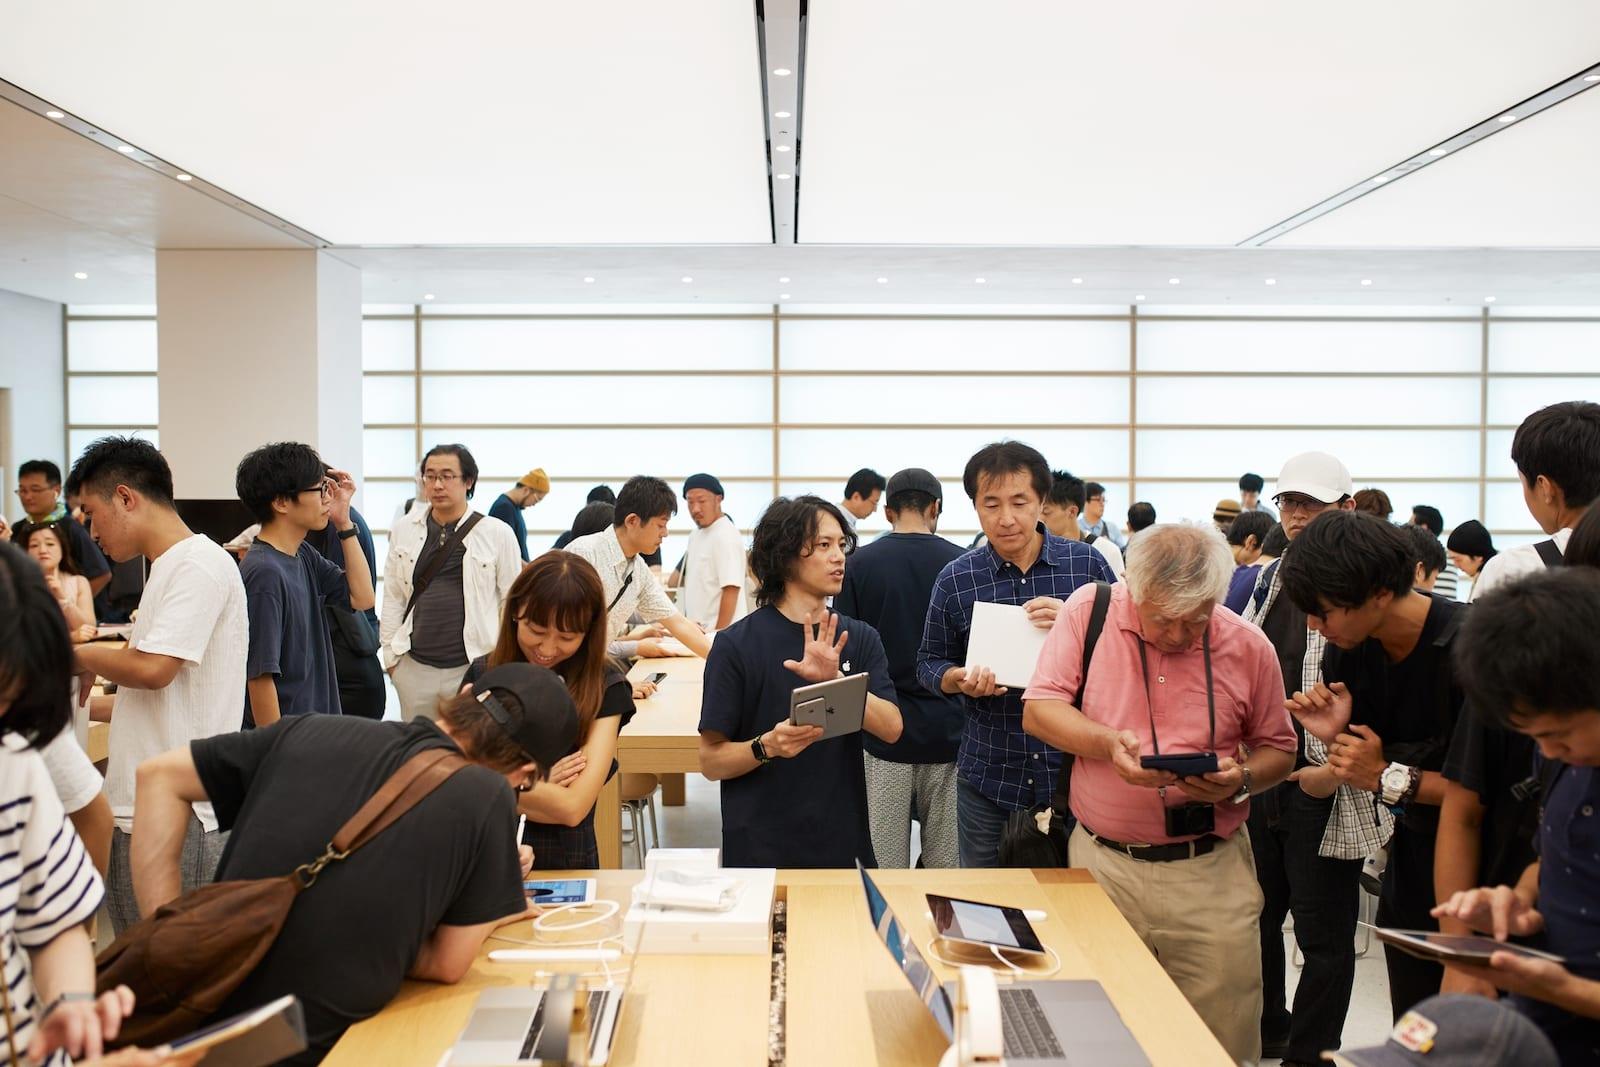 Apple Store opening Kyoto Shijo Apple employee 08252018 - Galéria: Pozrite si najnovší Apple Store v centre Kjóta